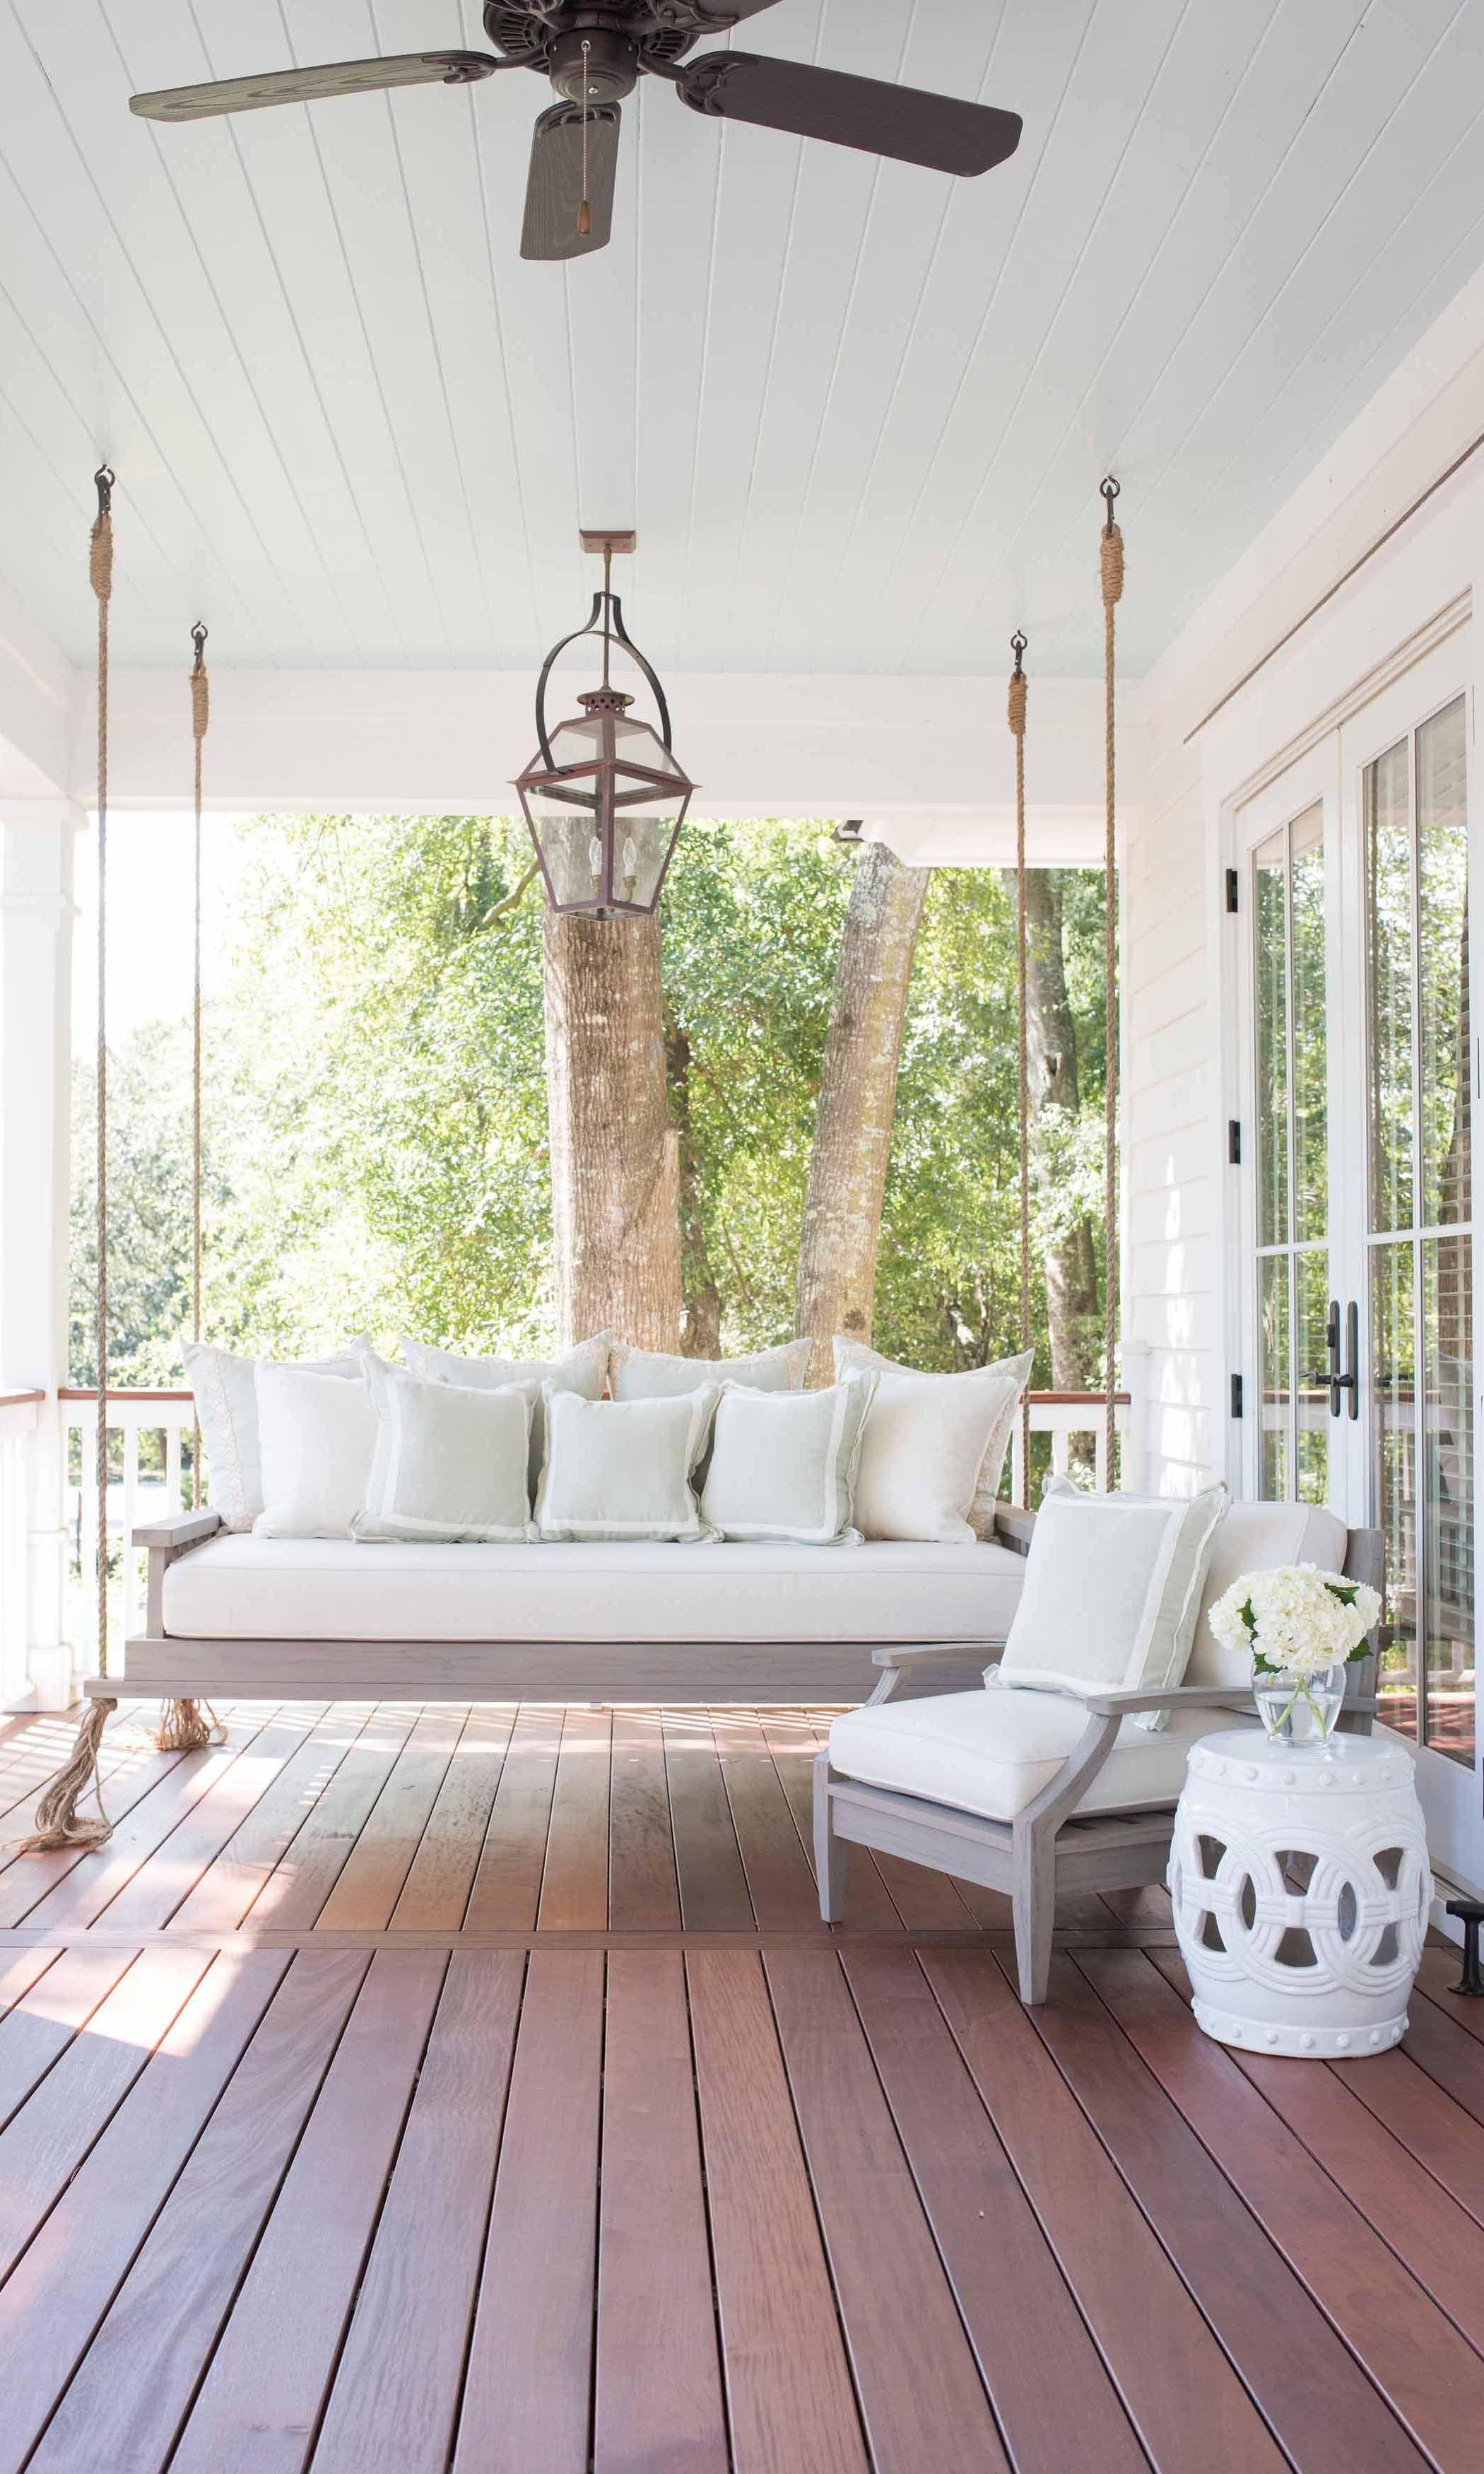 southern home decor inspiration porch furniture porch on porch swing ideas inspiration id=33542